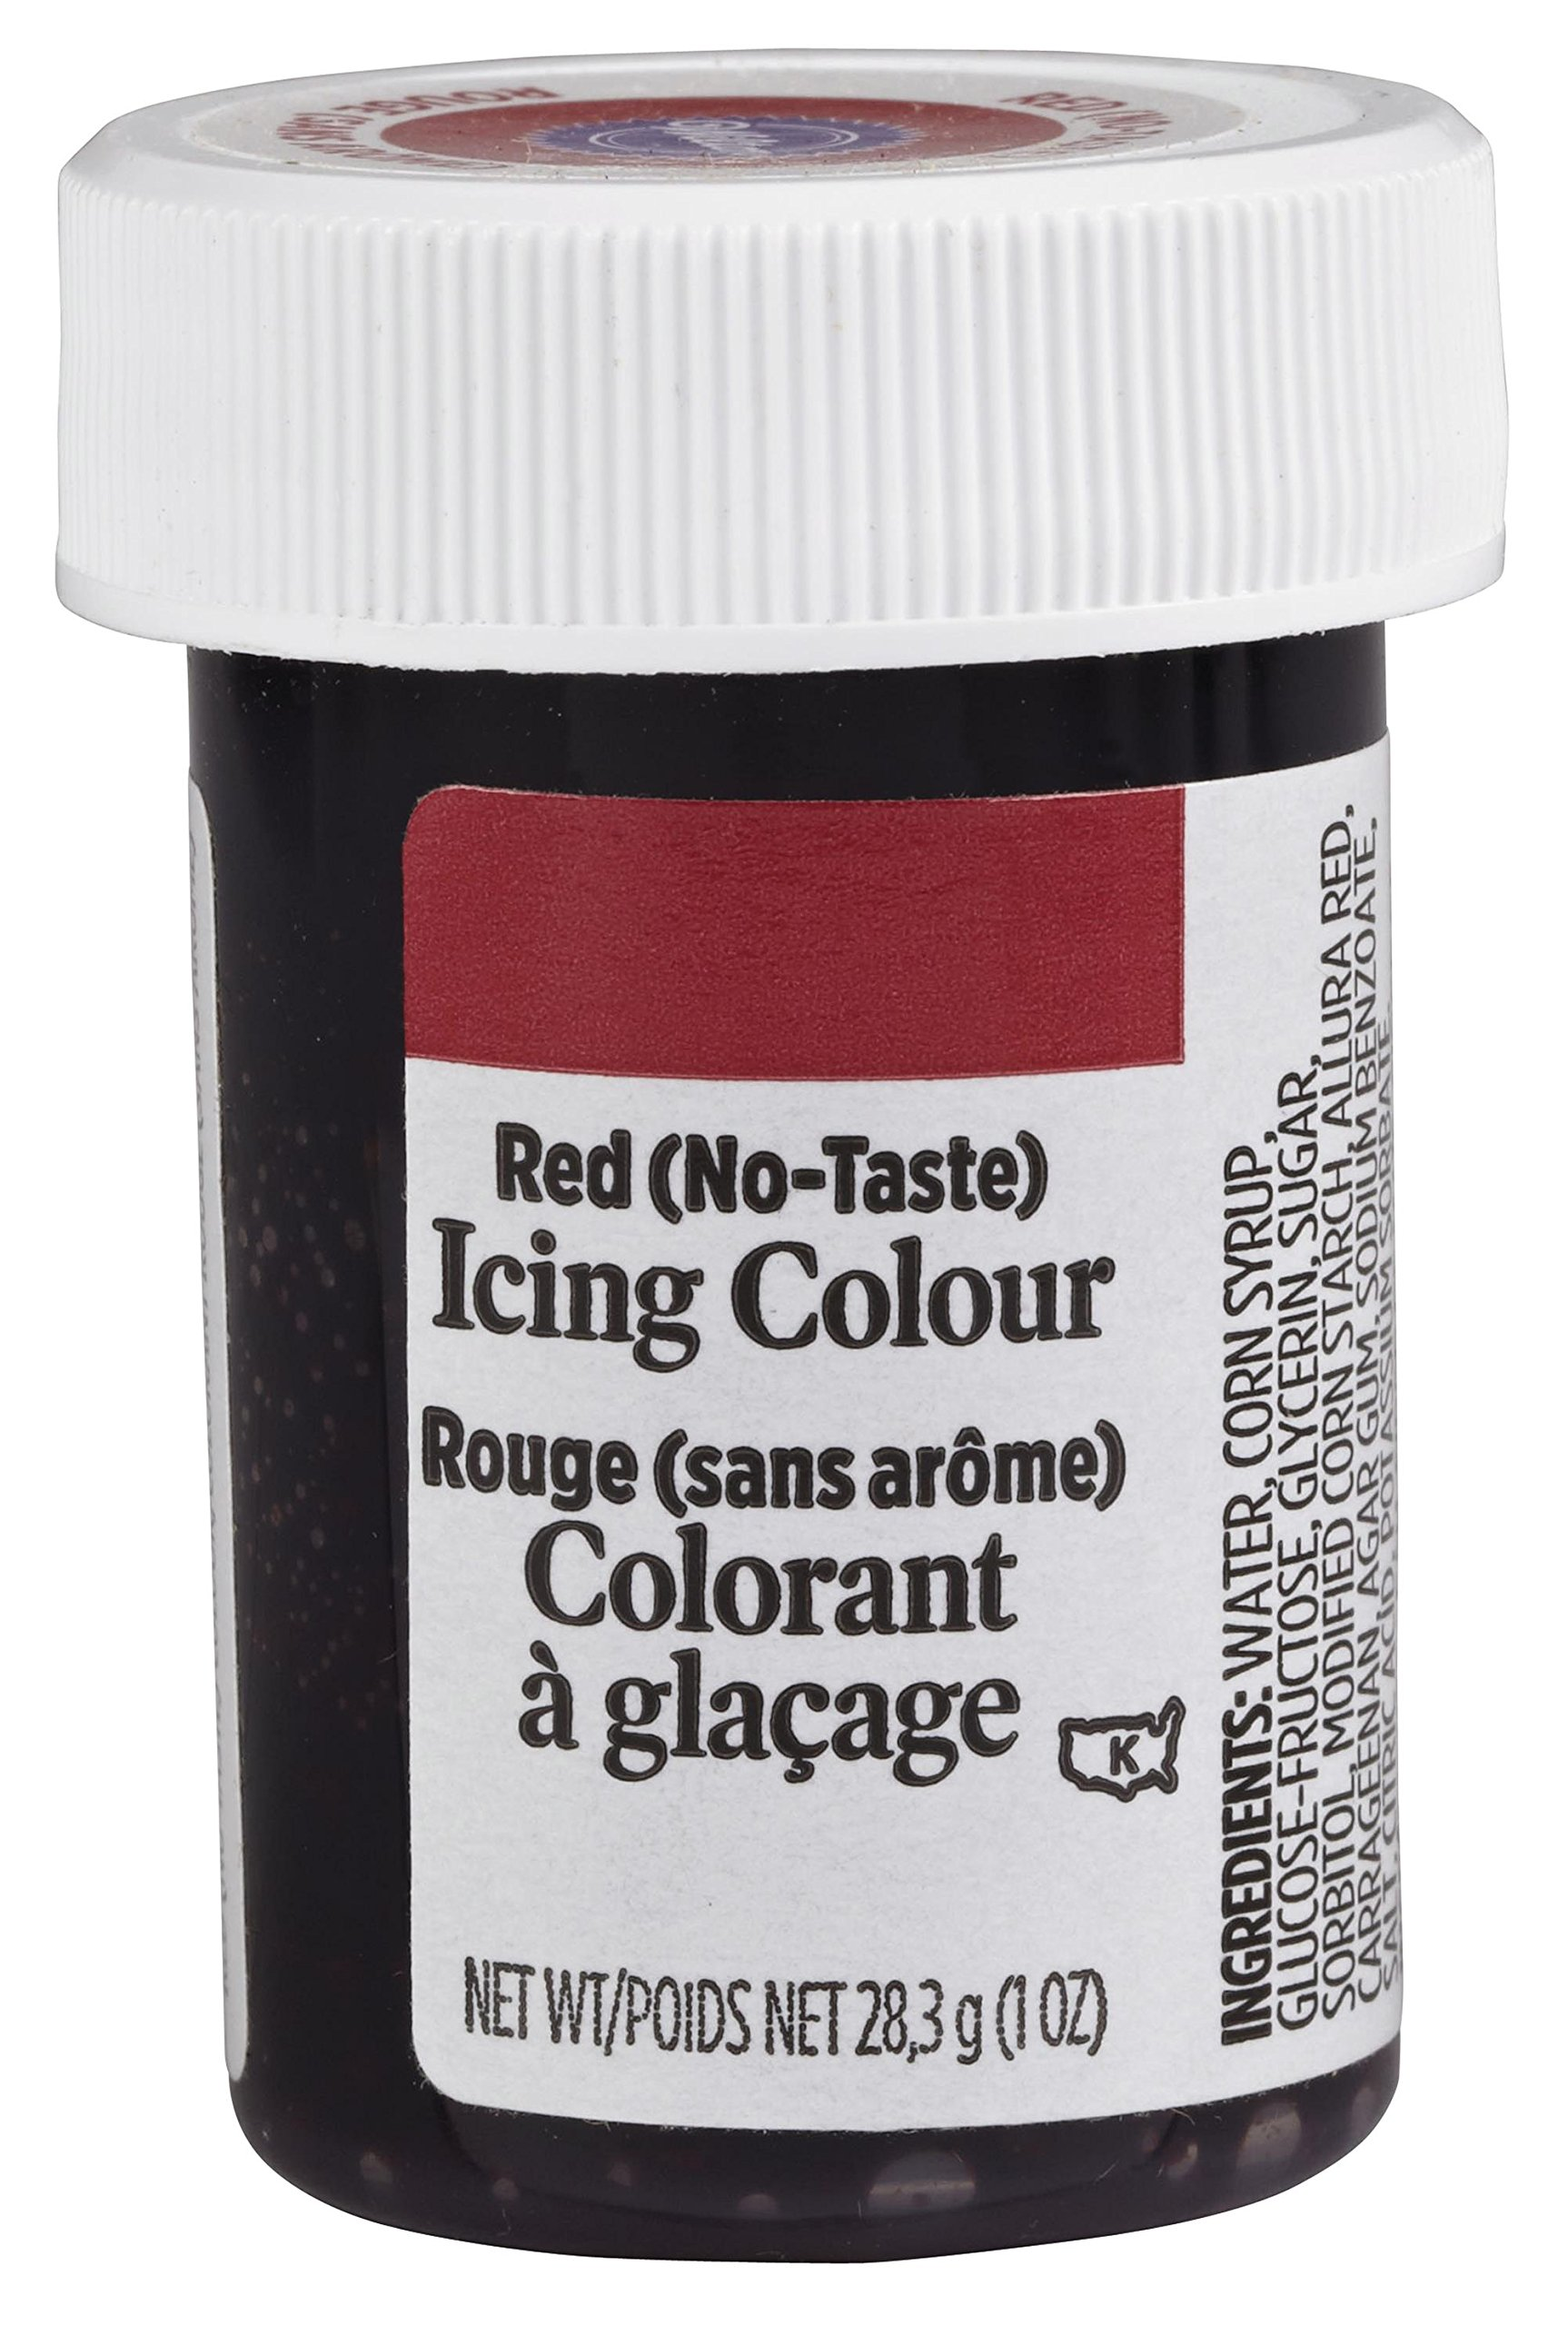 Wilton Icing 1 oz 610-998, Red No-Taste